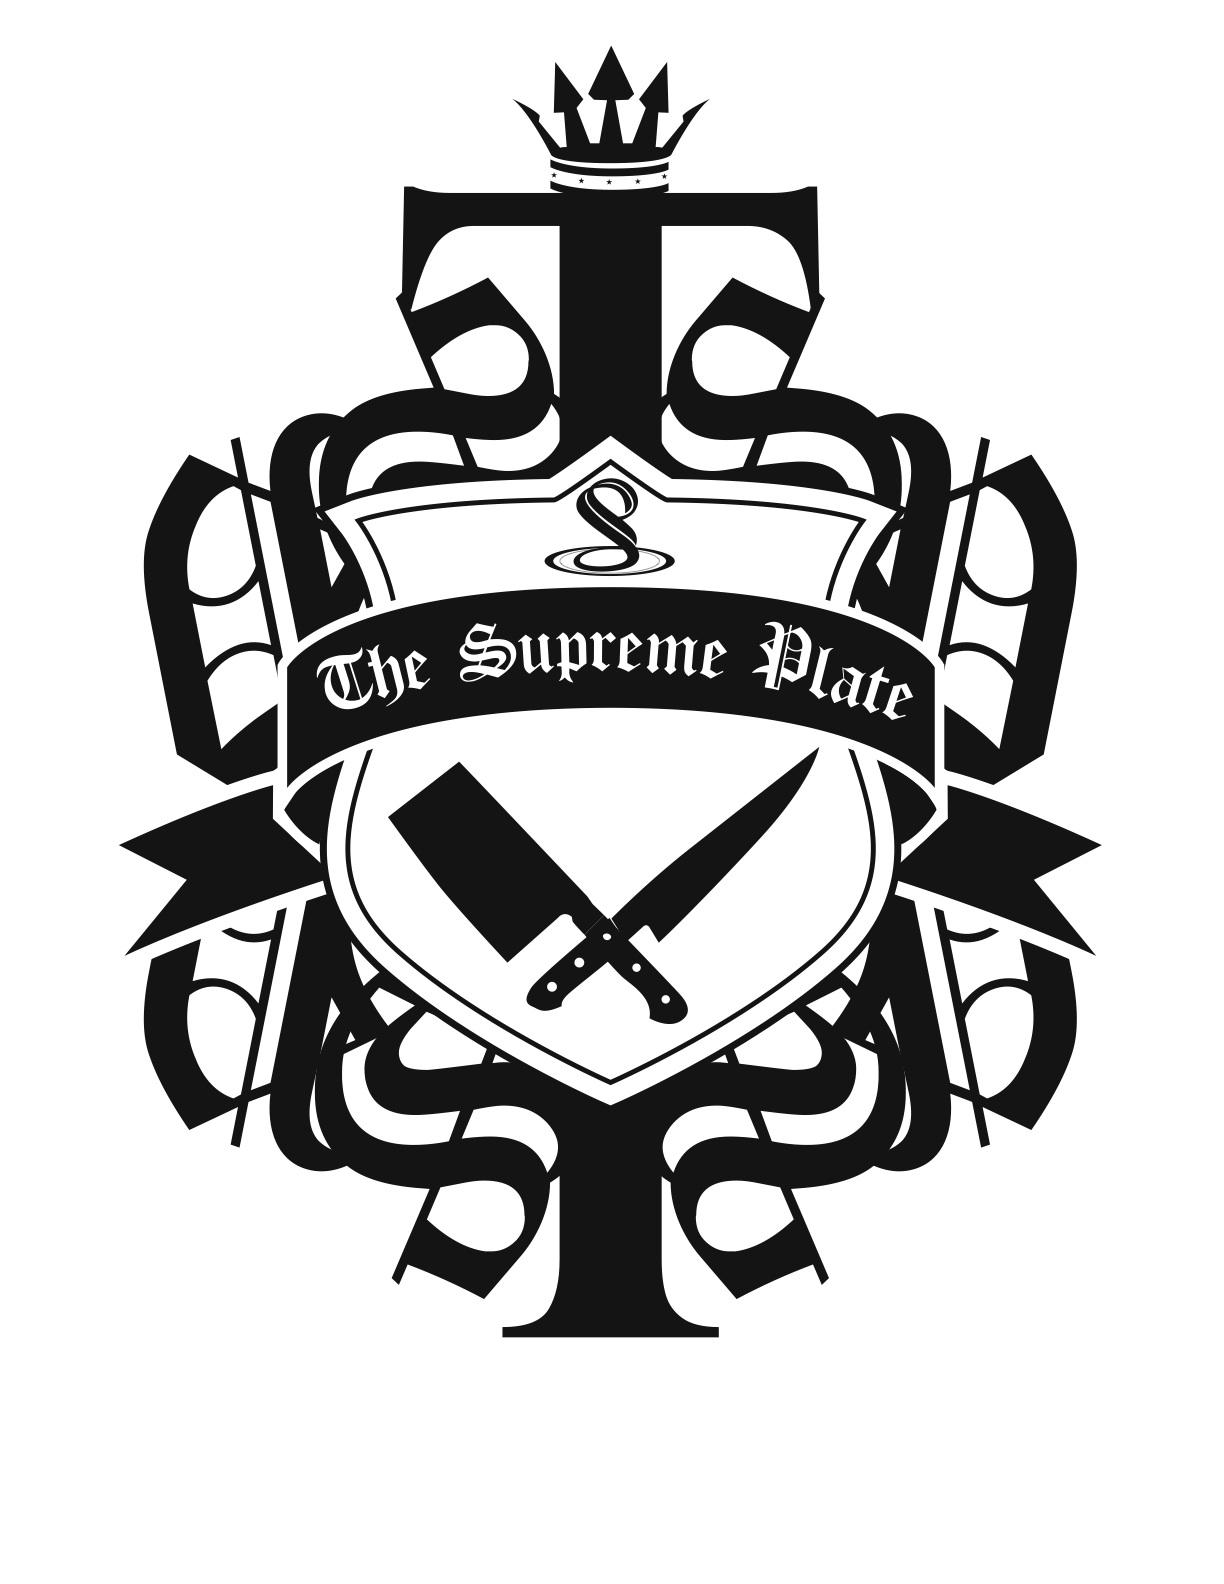 The Supreme Plate The Supreme Plate Forever Evolving